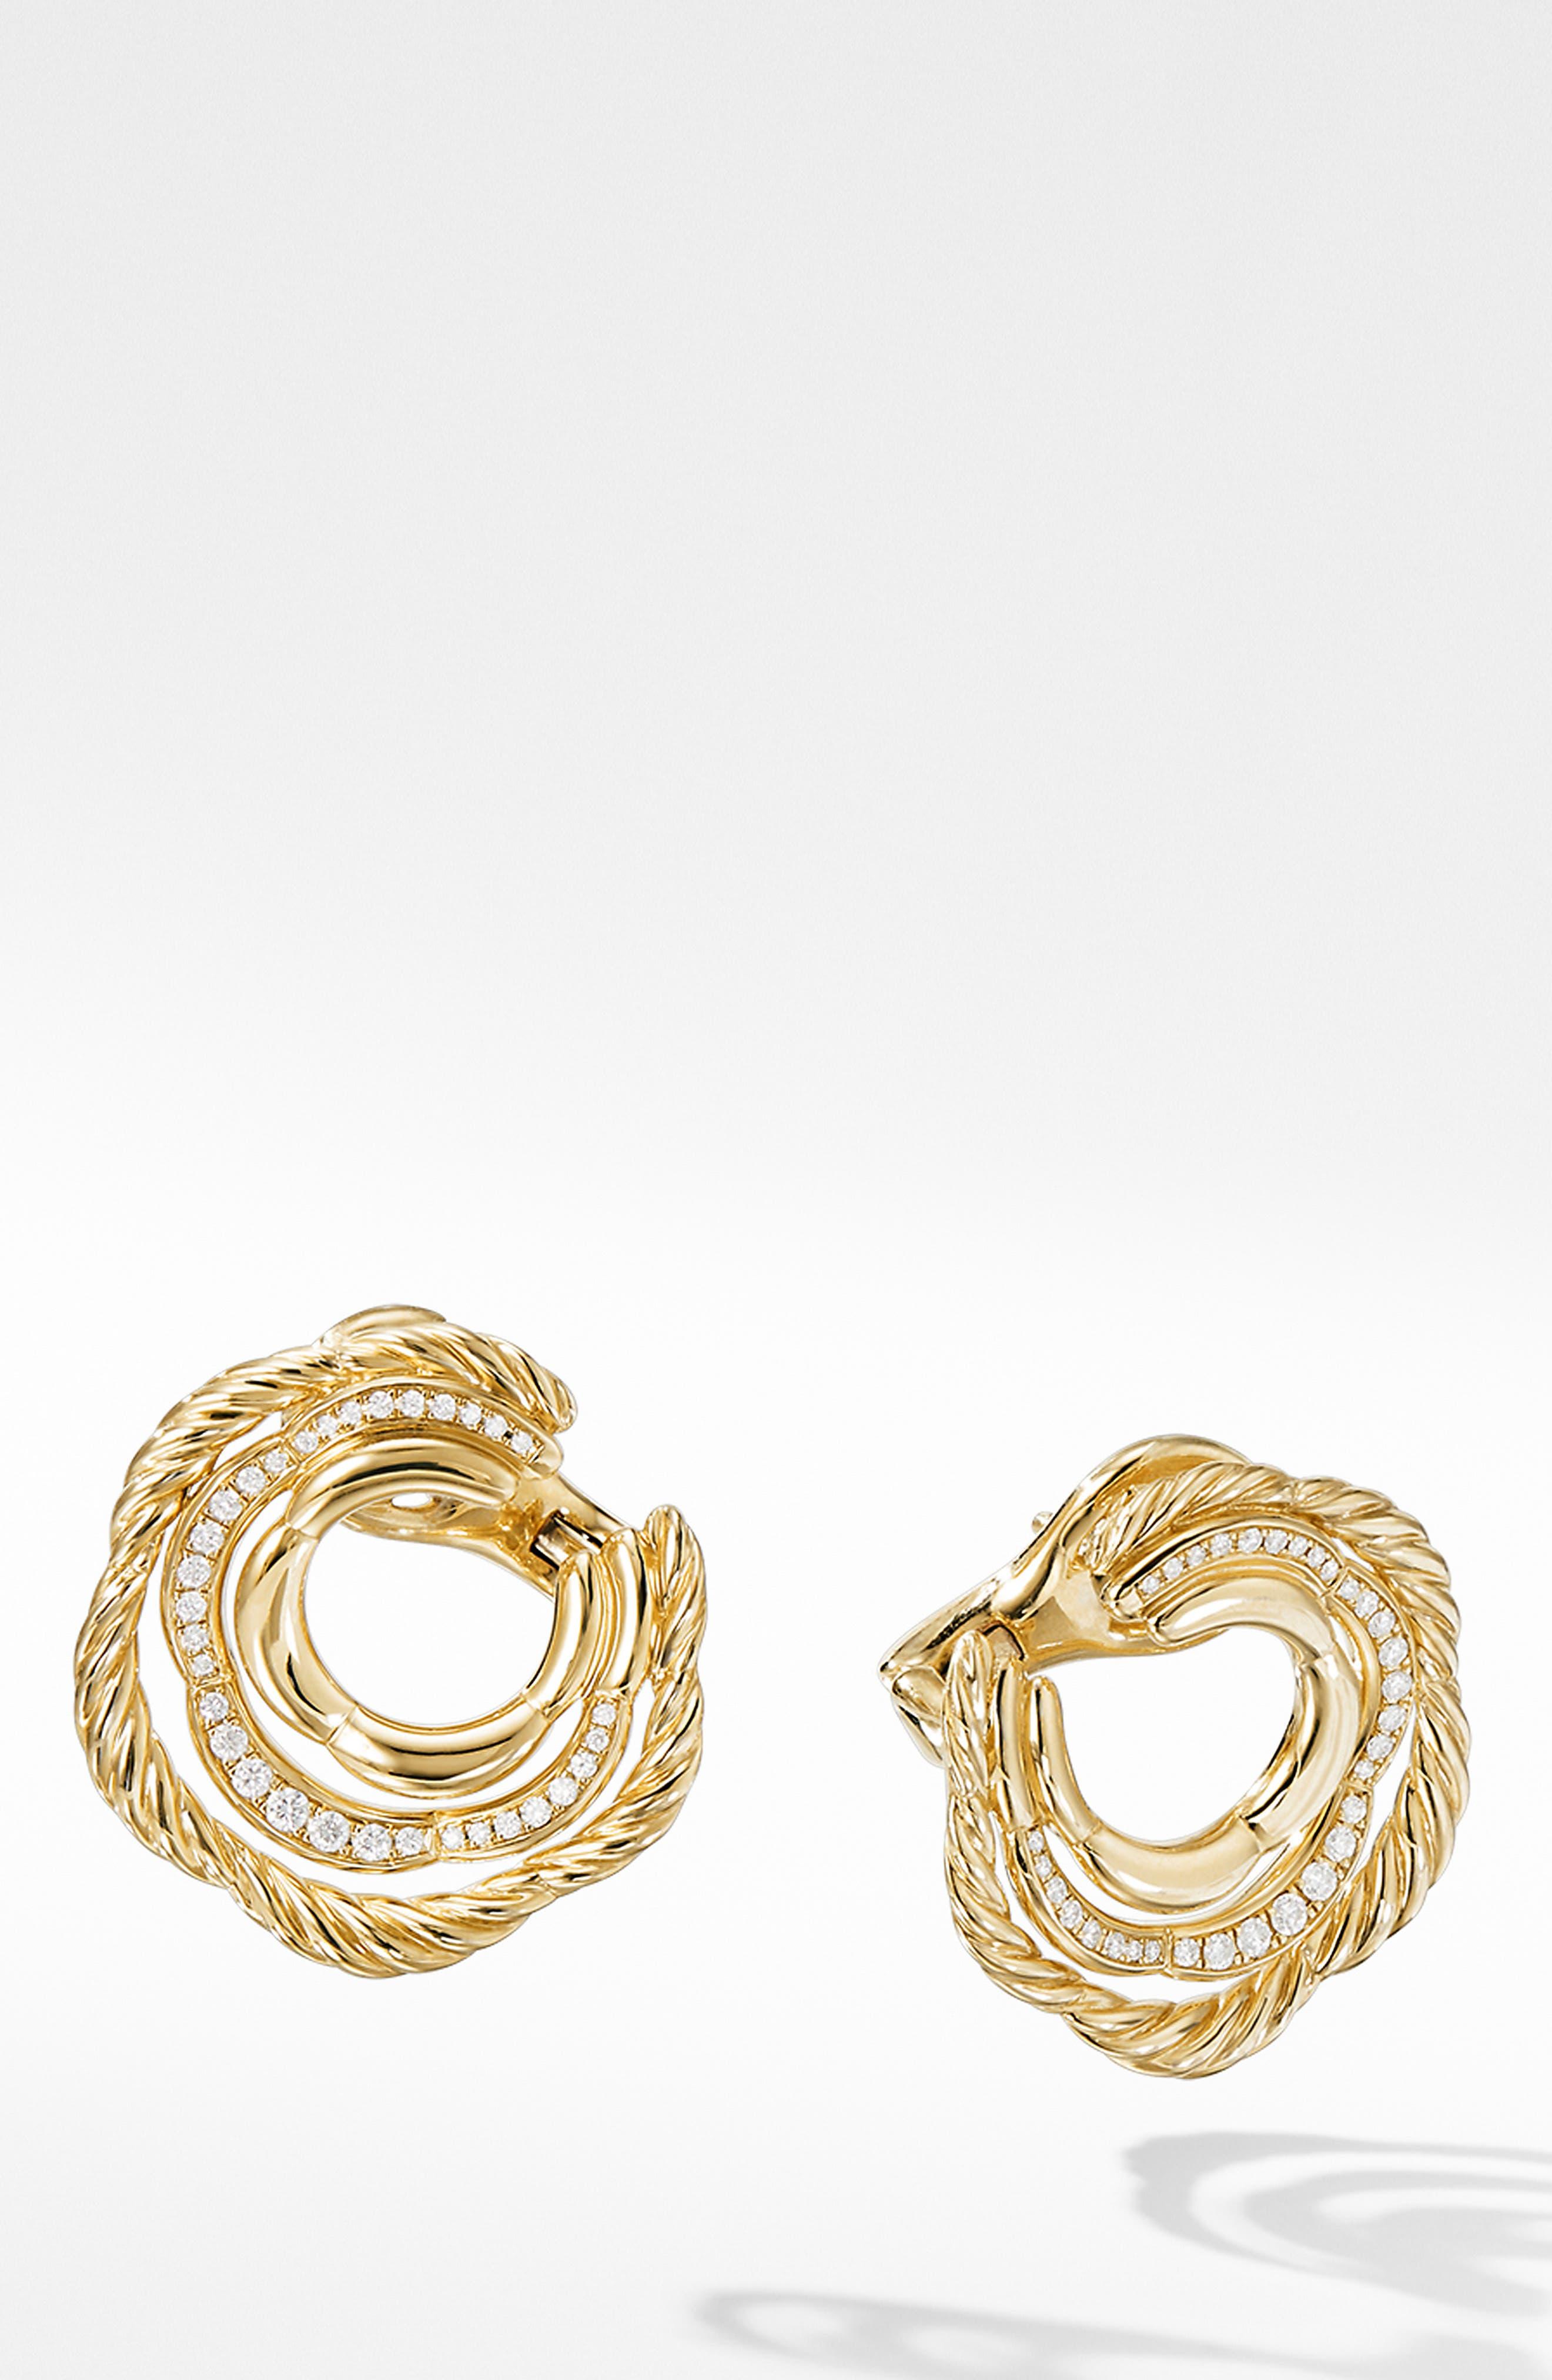 Tides Huggie Hoop Earrings with Pavé Diamonds,                             Main thumbnail 1, color,                             GOLD/ DIAMOND